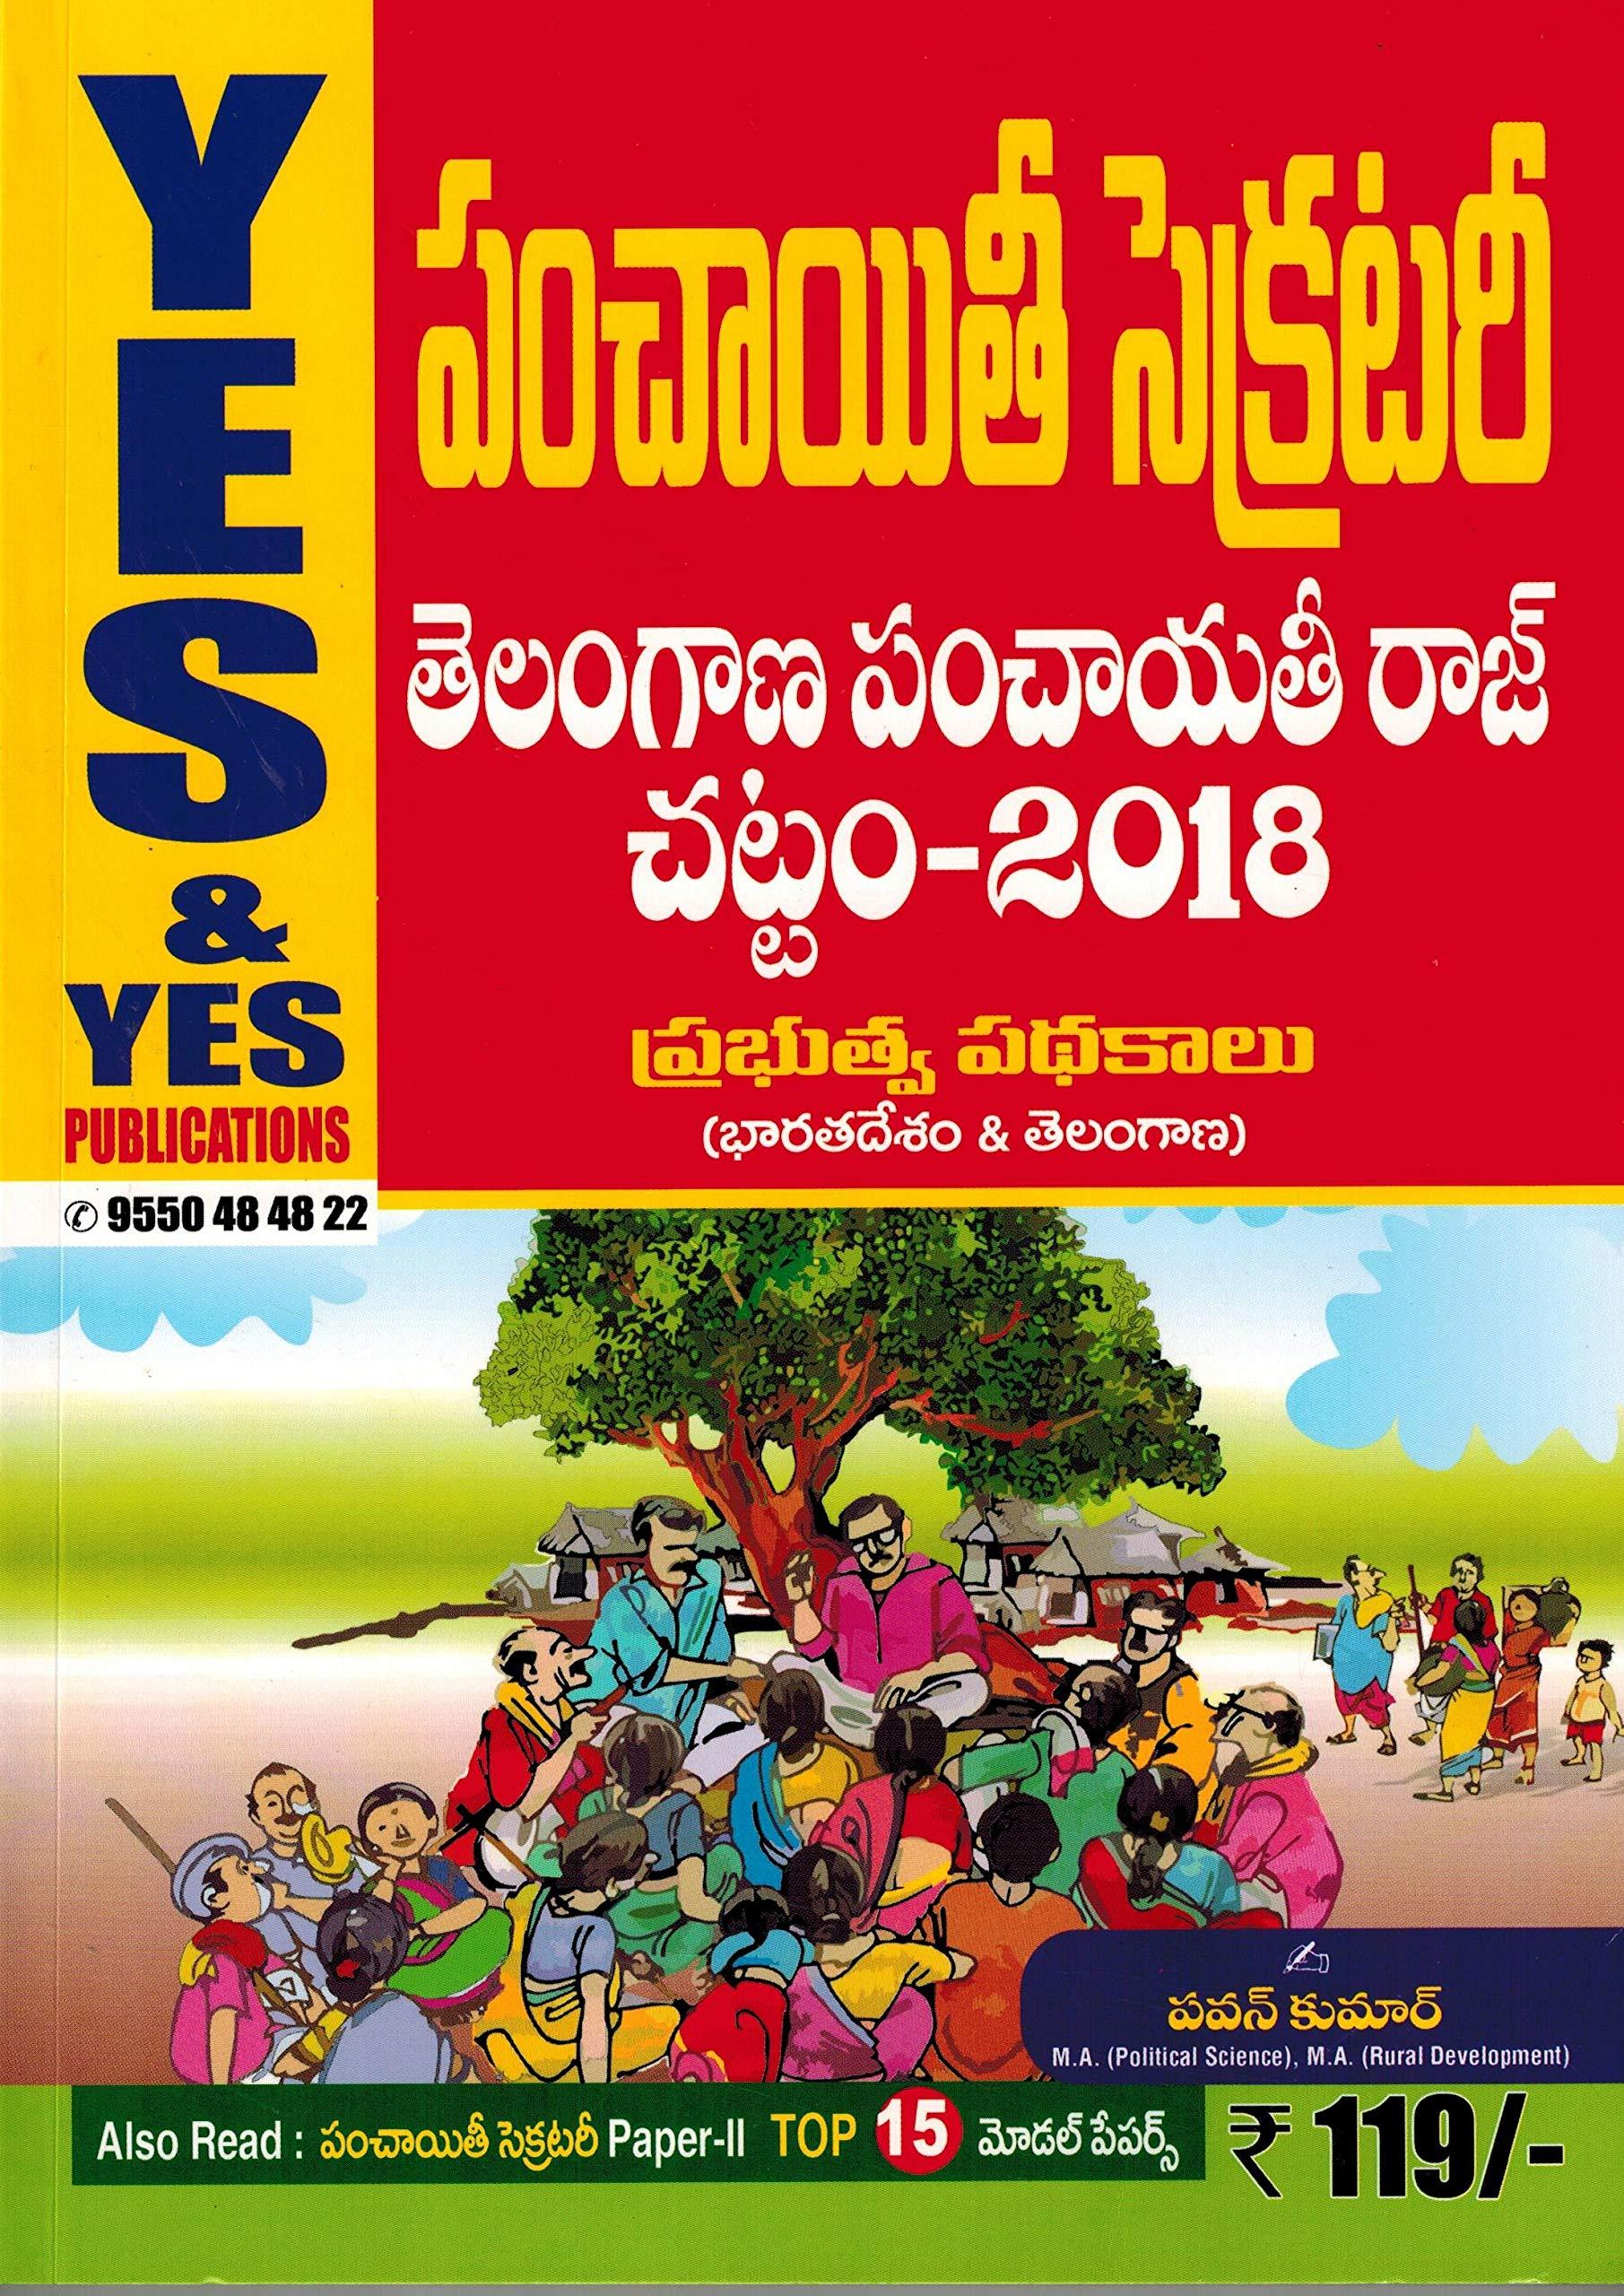 Buy Telangana Panchayat Secretary Acts 2018 and Schemes of India and